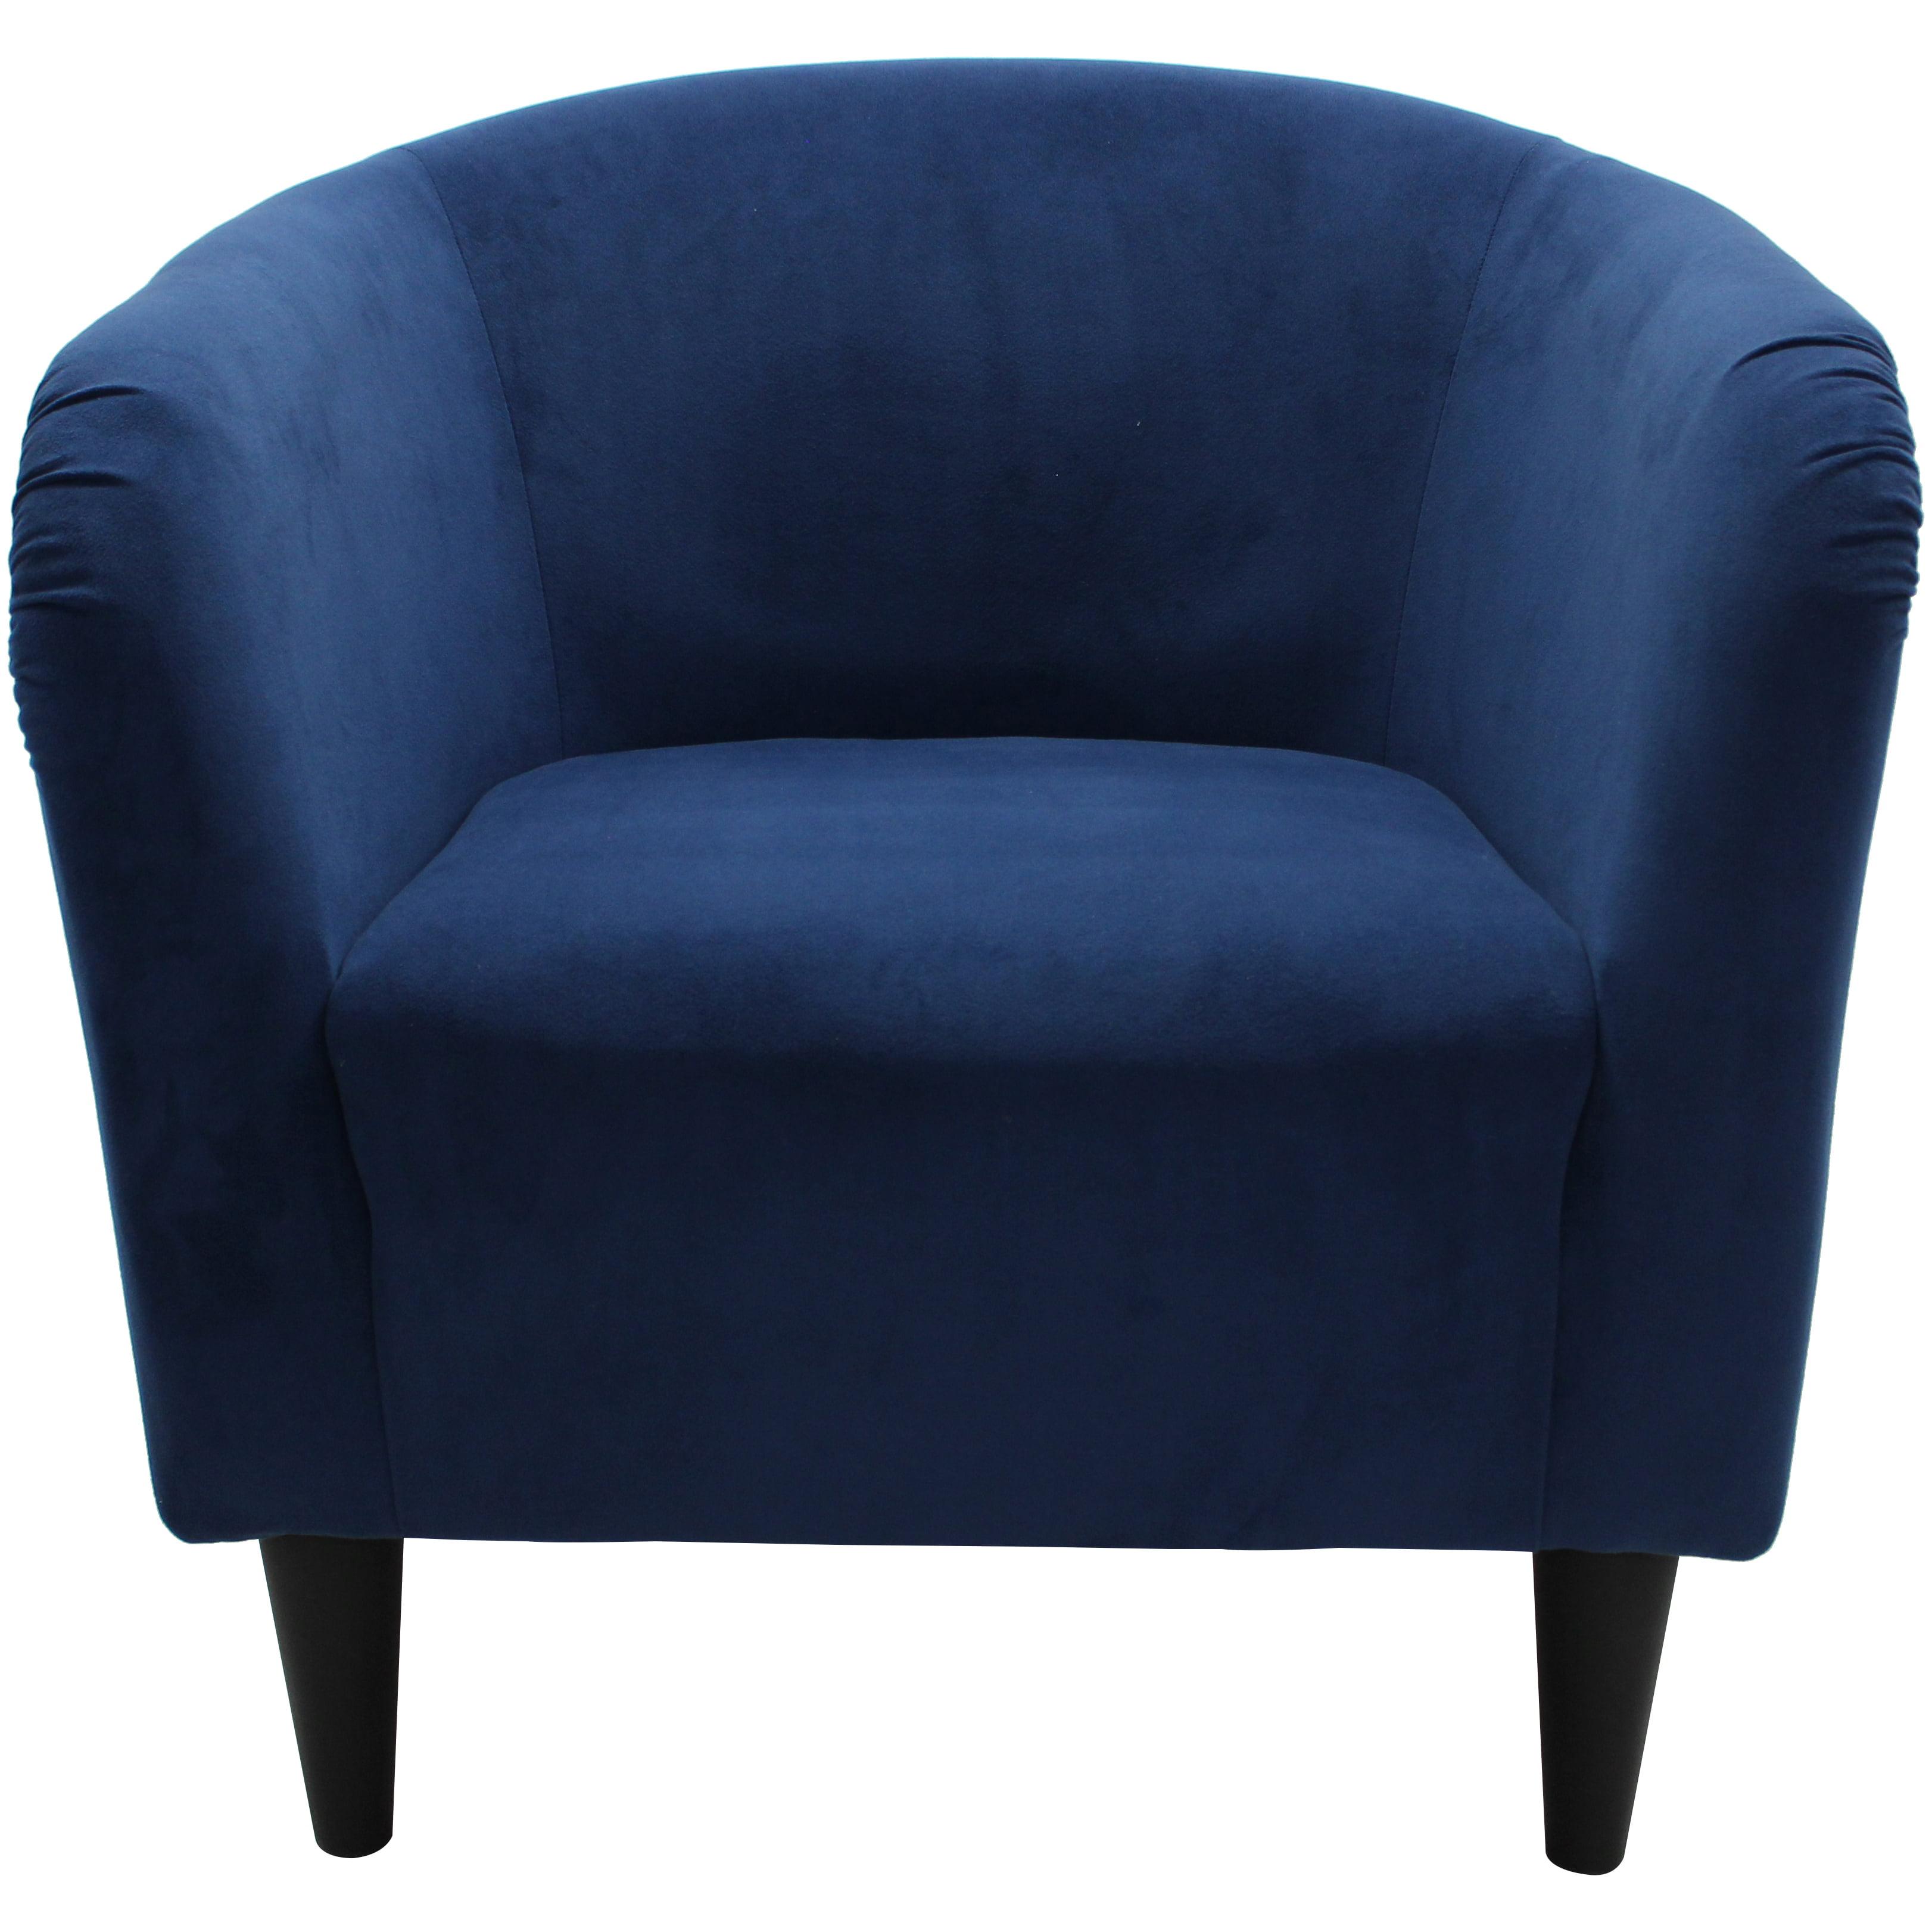 Mainstays Microfiber Tub Accent Chair - Walmart.com